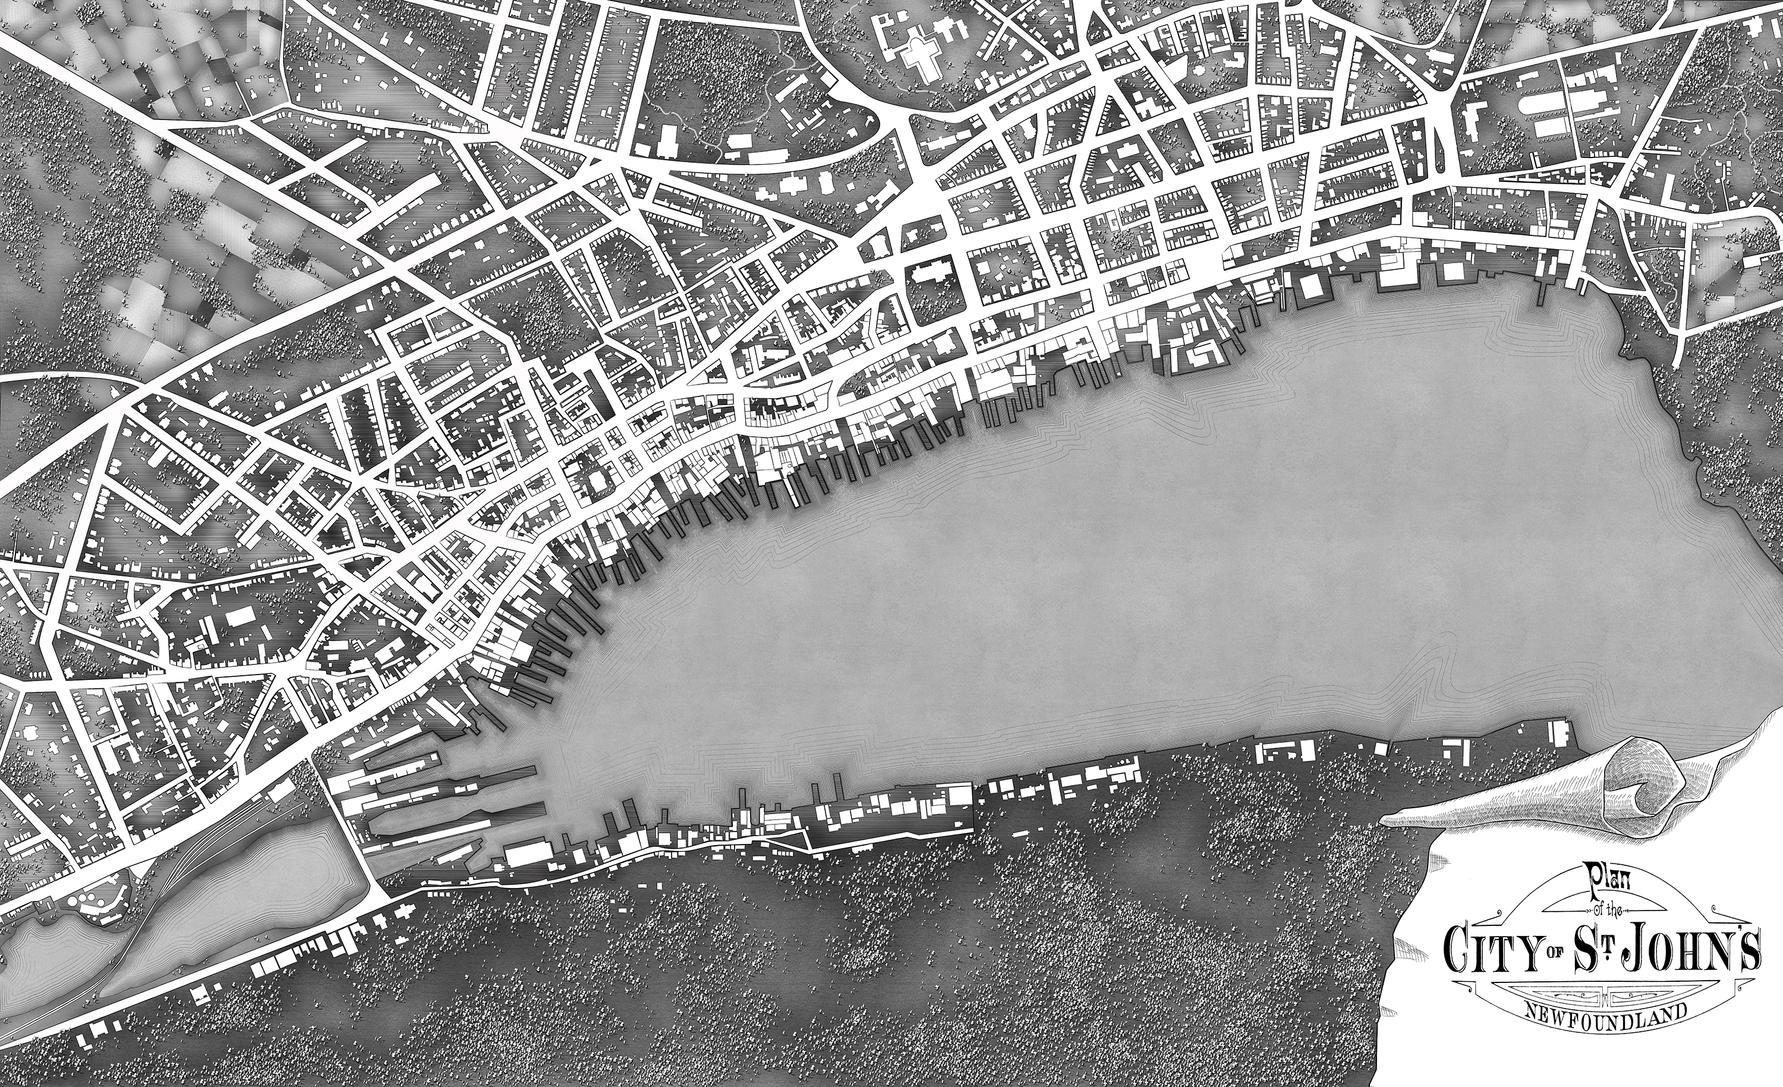 St. Johns city map